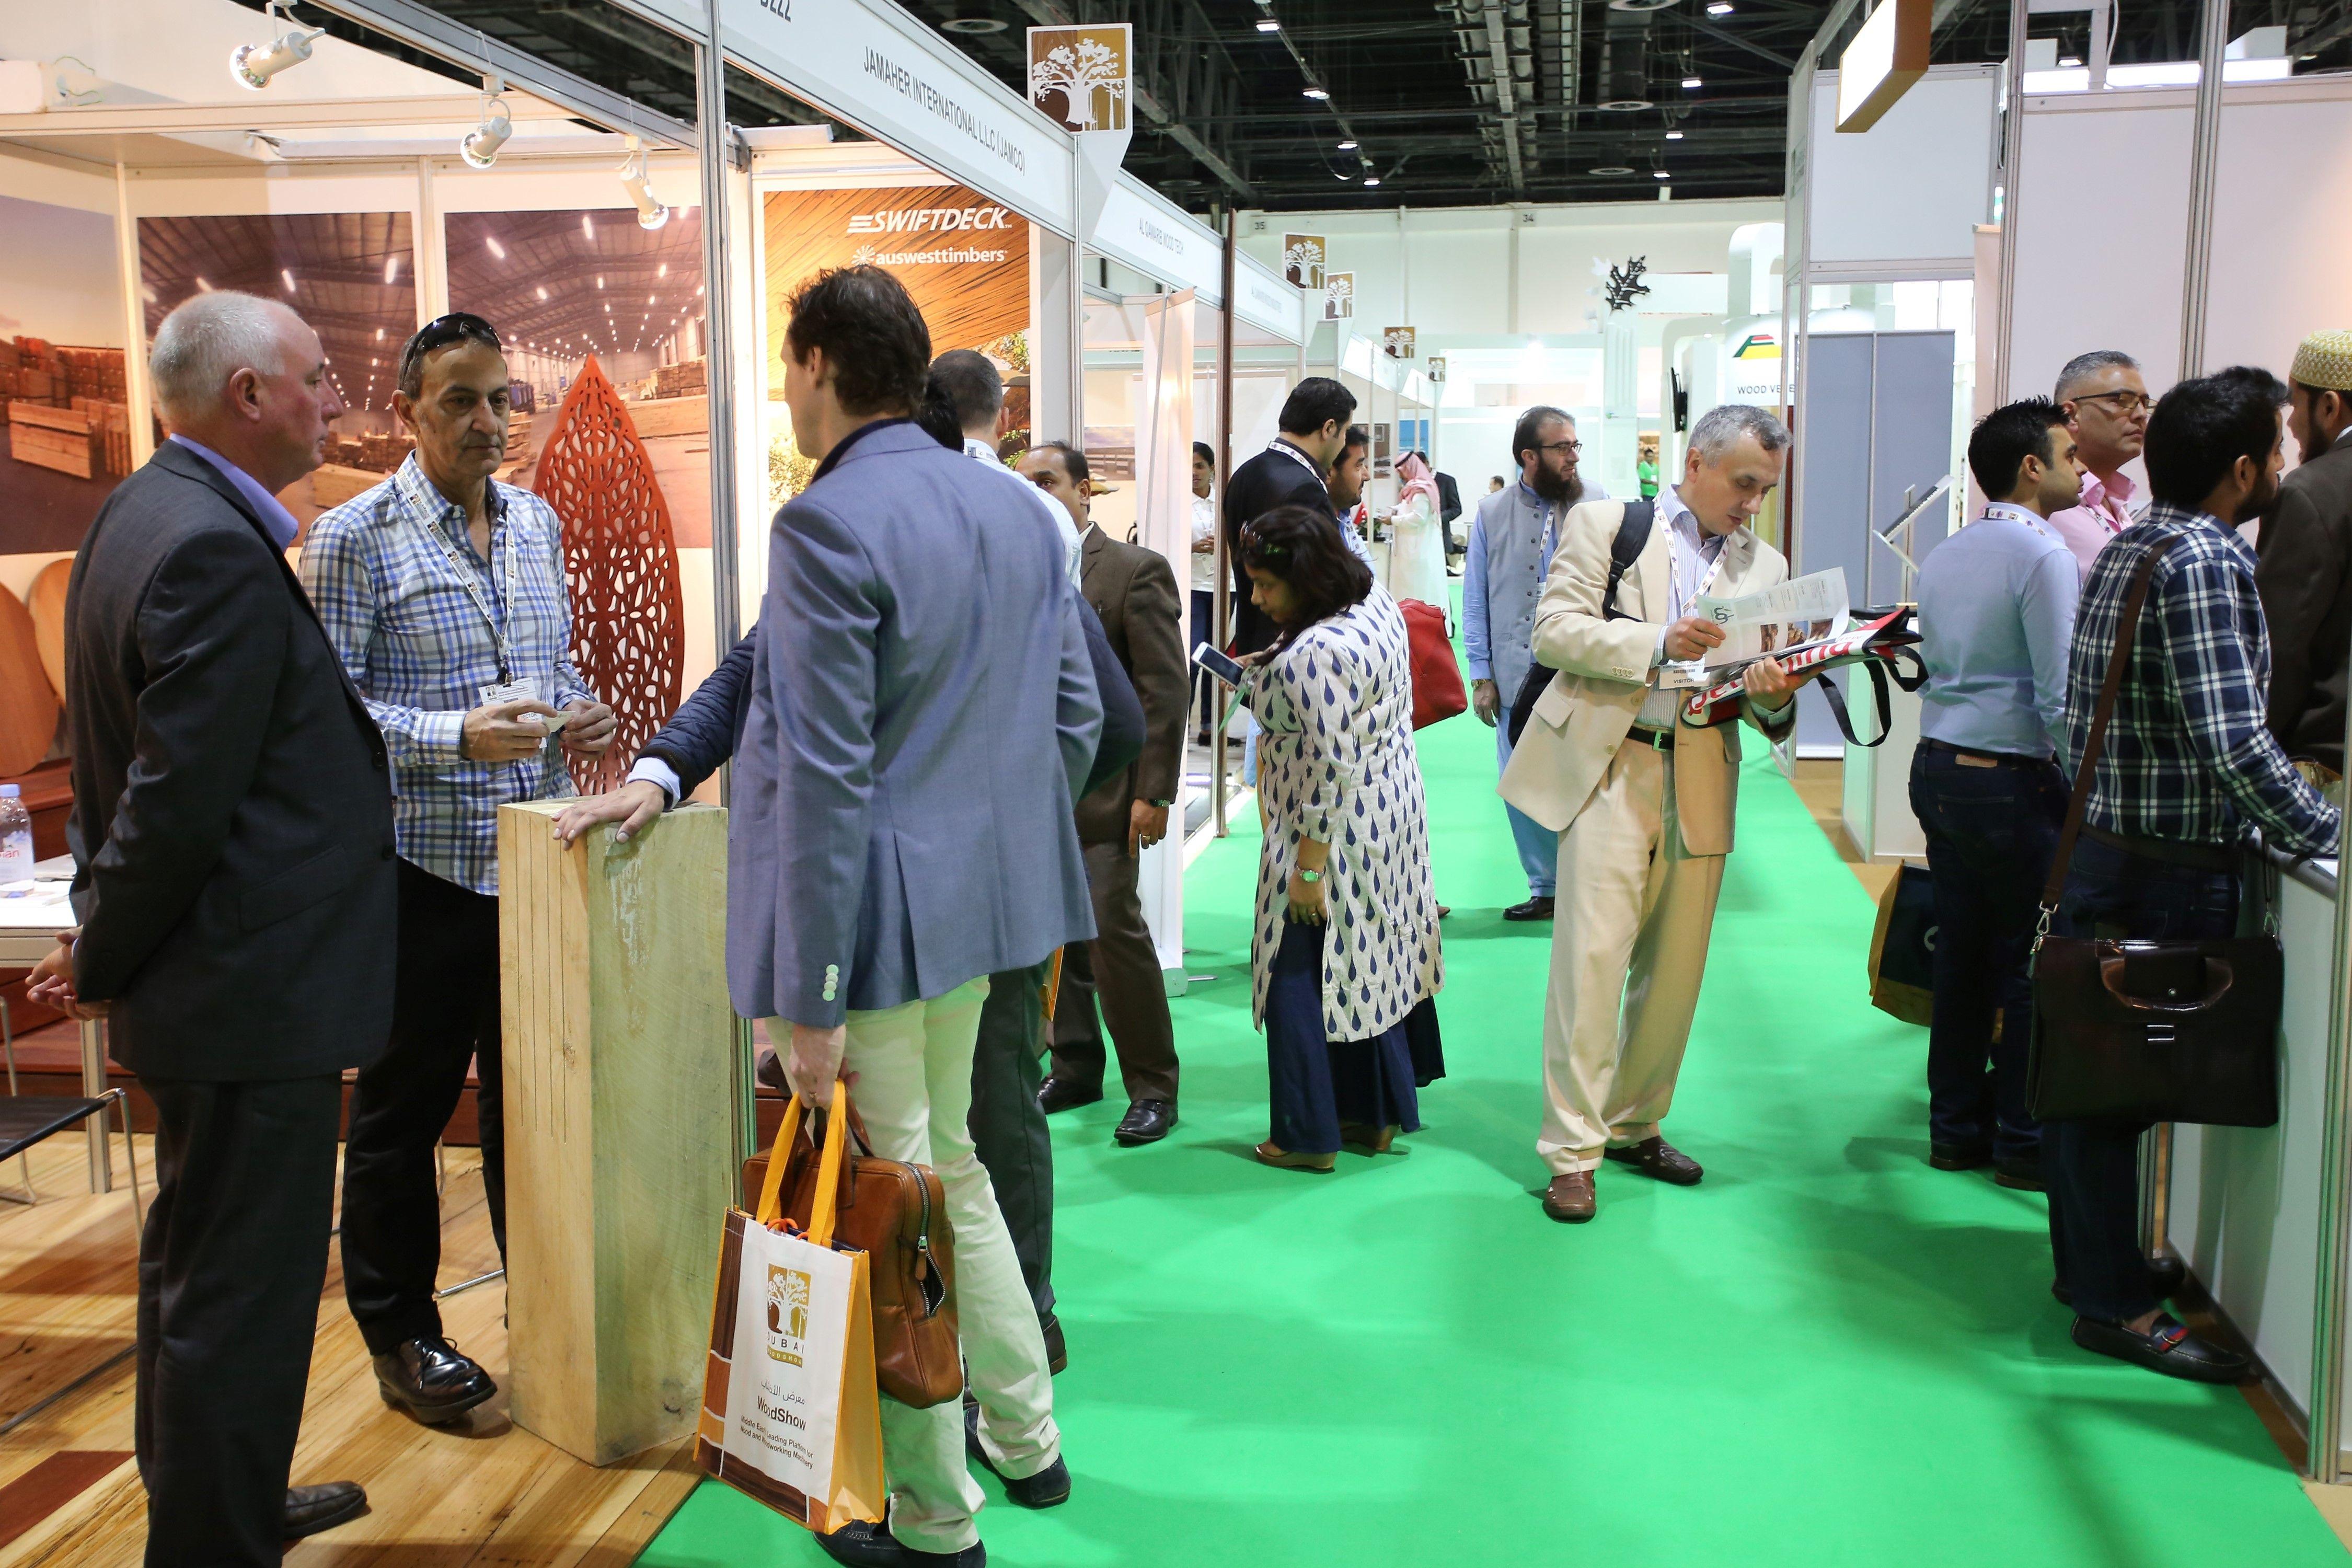 Dubai woodshow - Organisateurs de salons ...